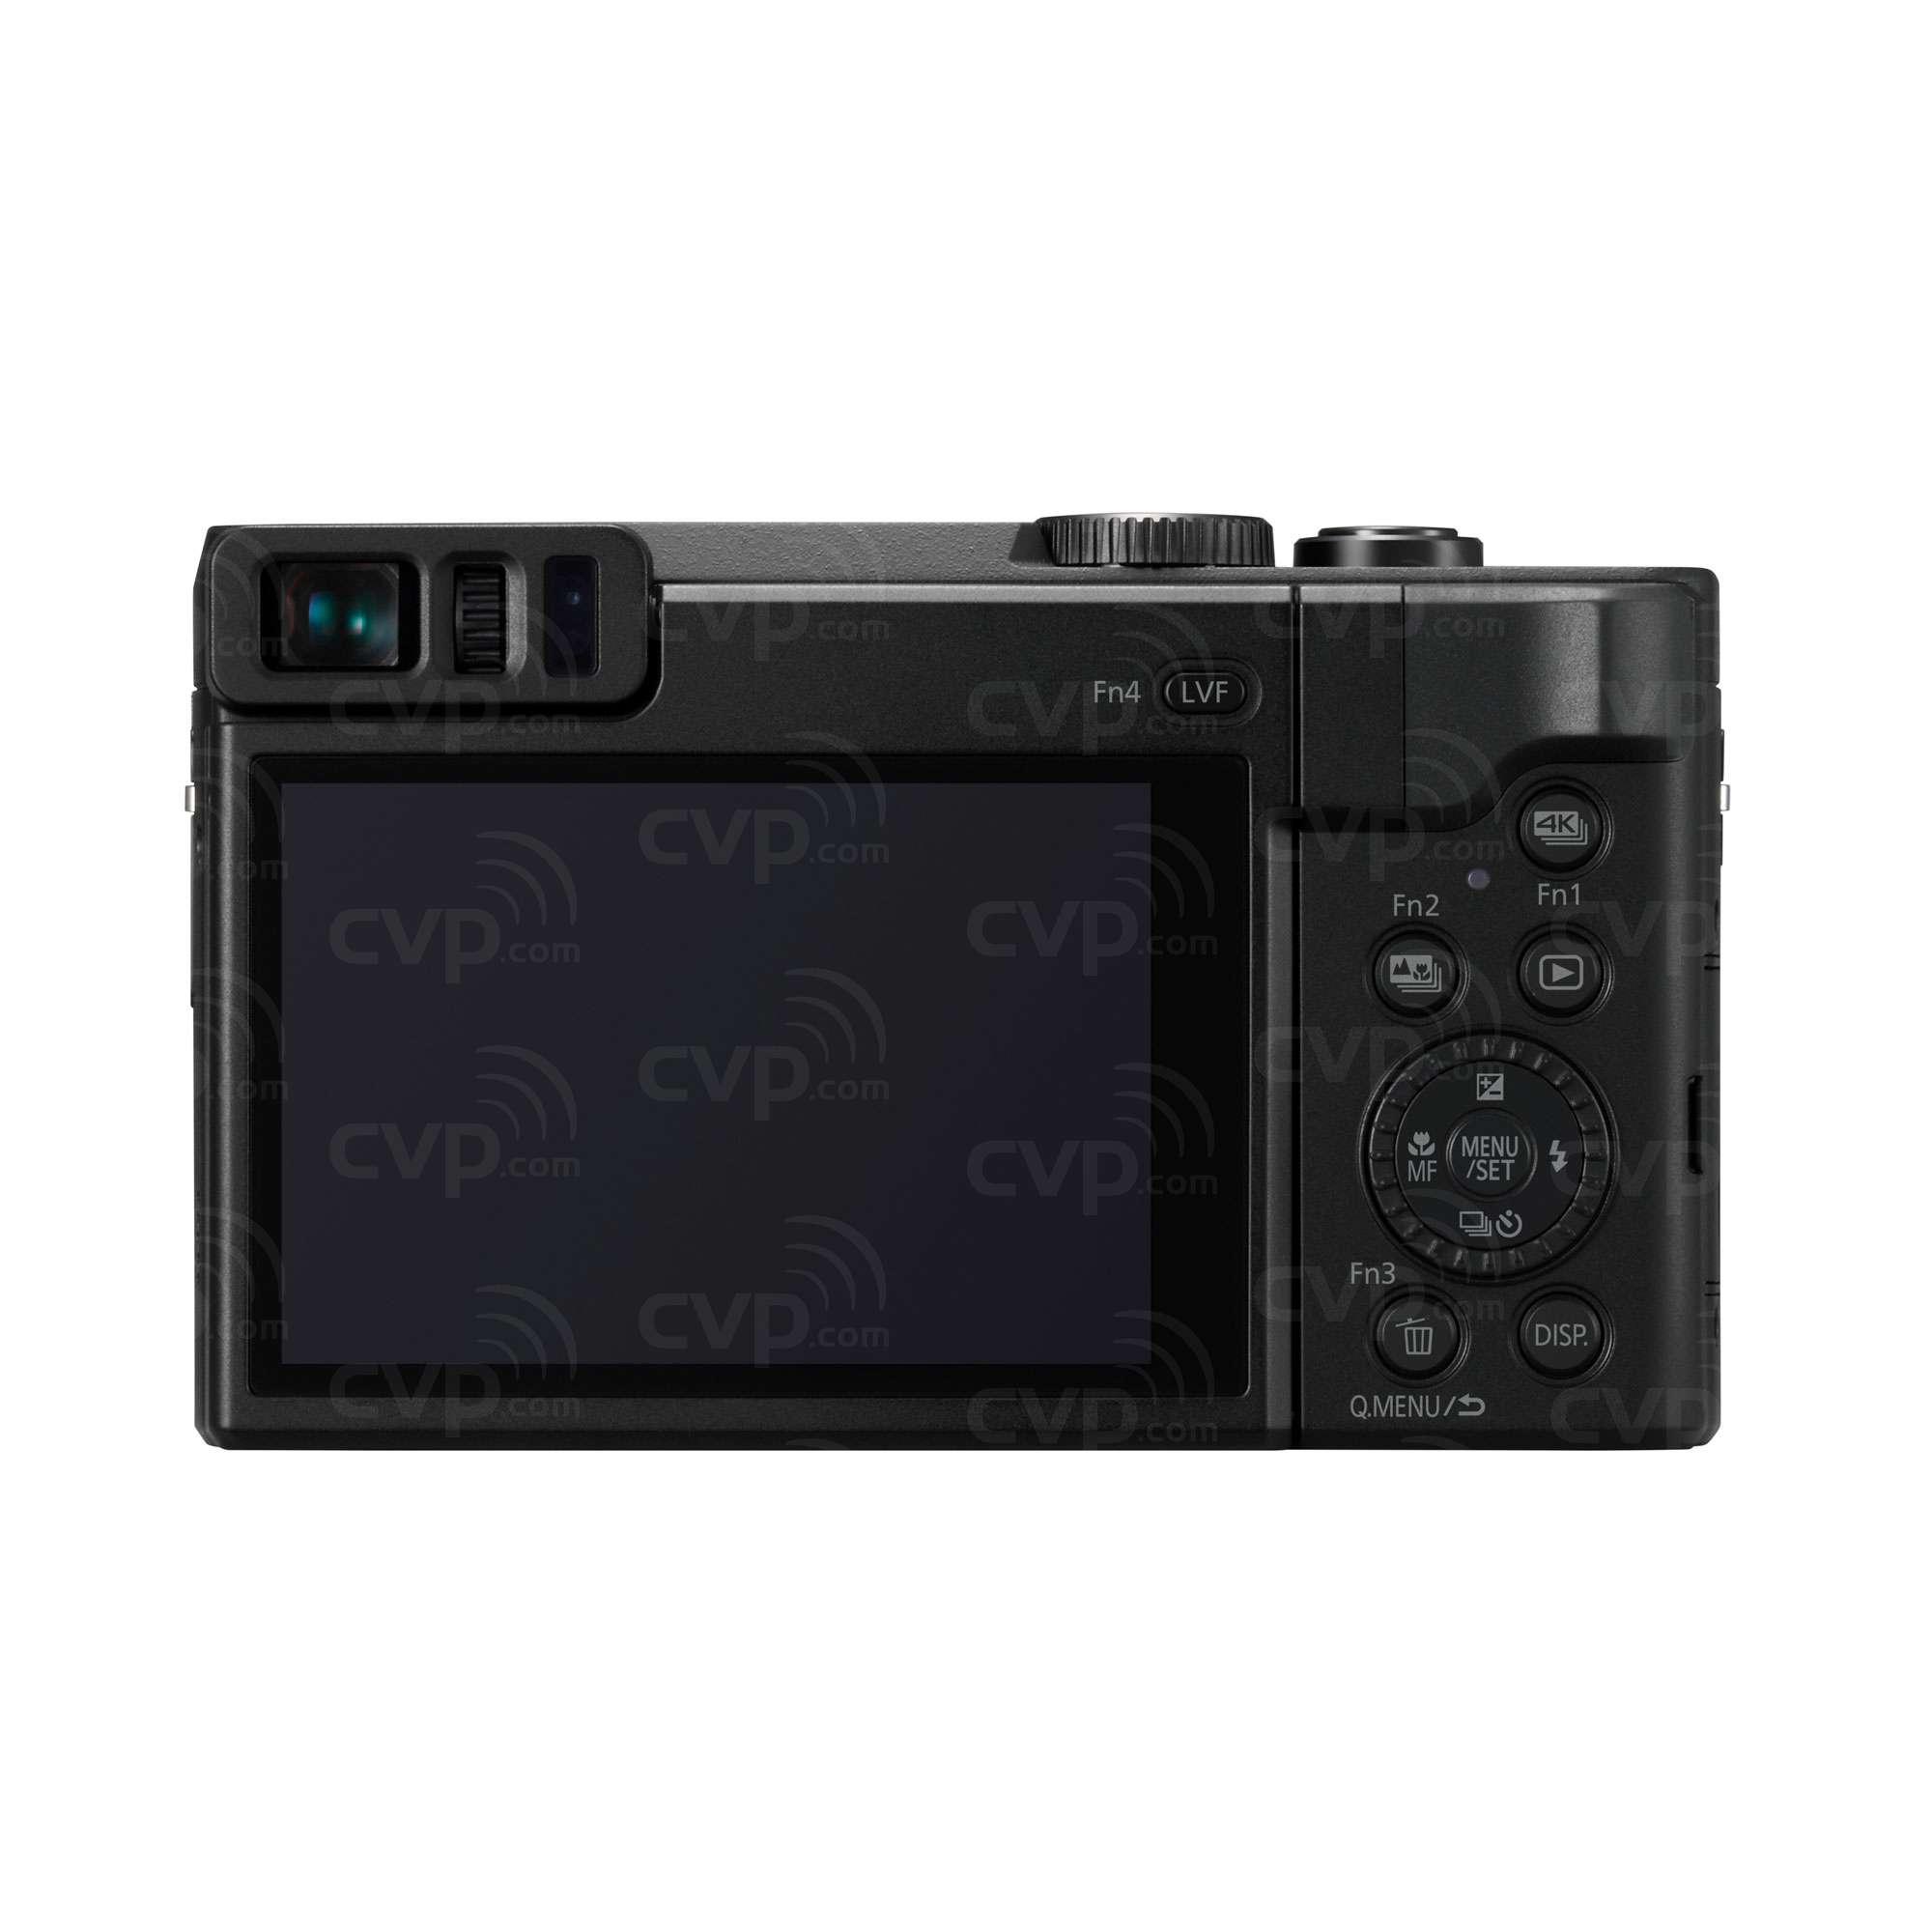 Panasonic Lumix DC-TZ90 20.3 MP 30x Digital Compact Camera with